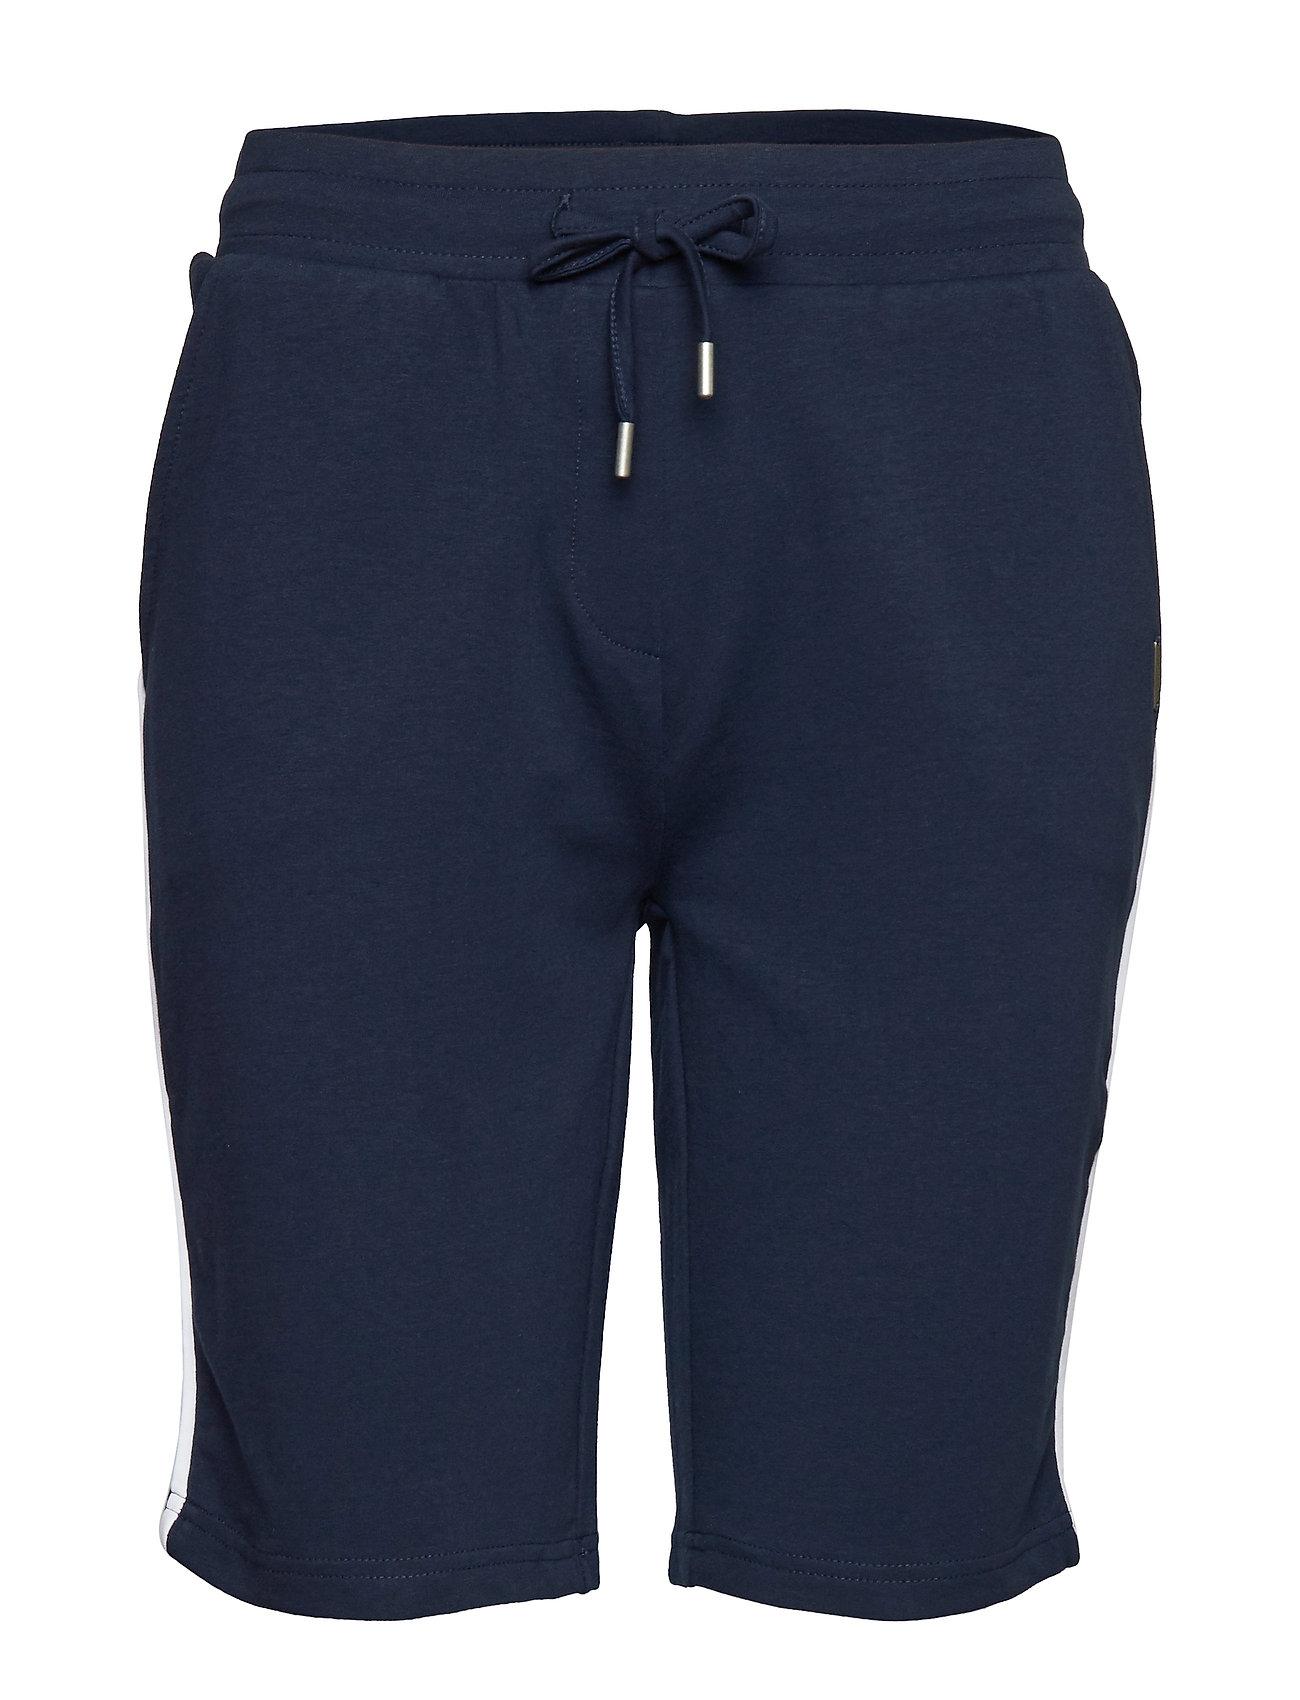 Brandtex Shorts-knitted - MIDNIGHT BLUE